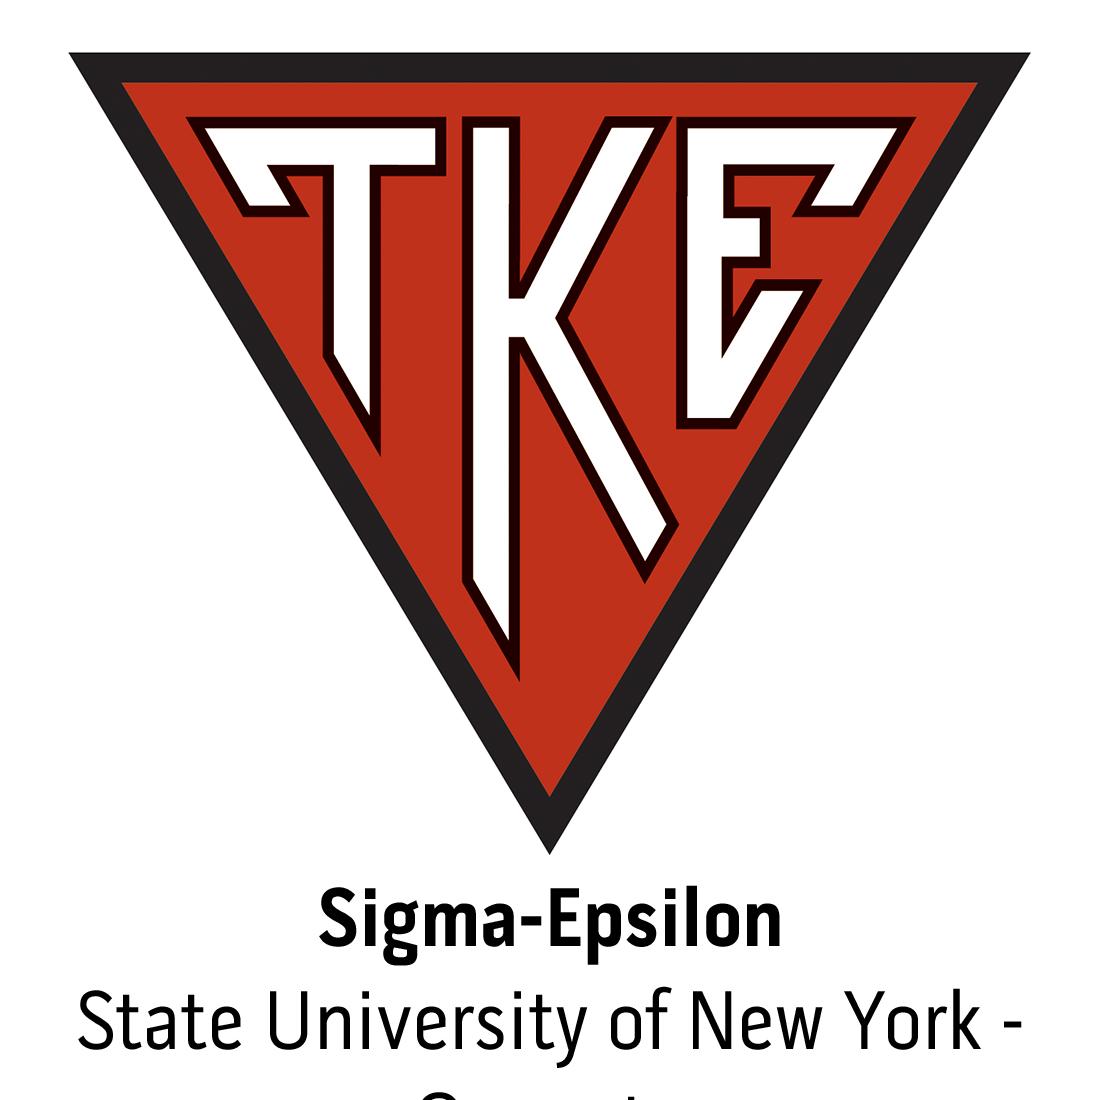 Sigma-Epsilon Colony at State University of New York - Oneonta